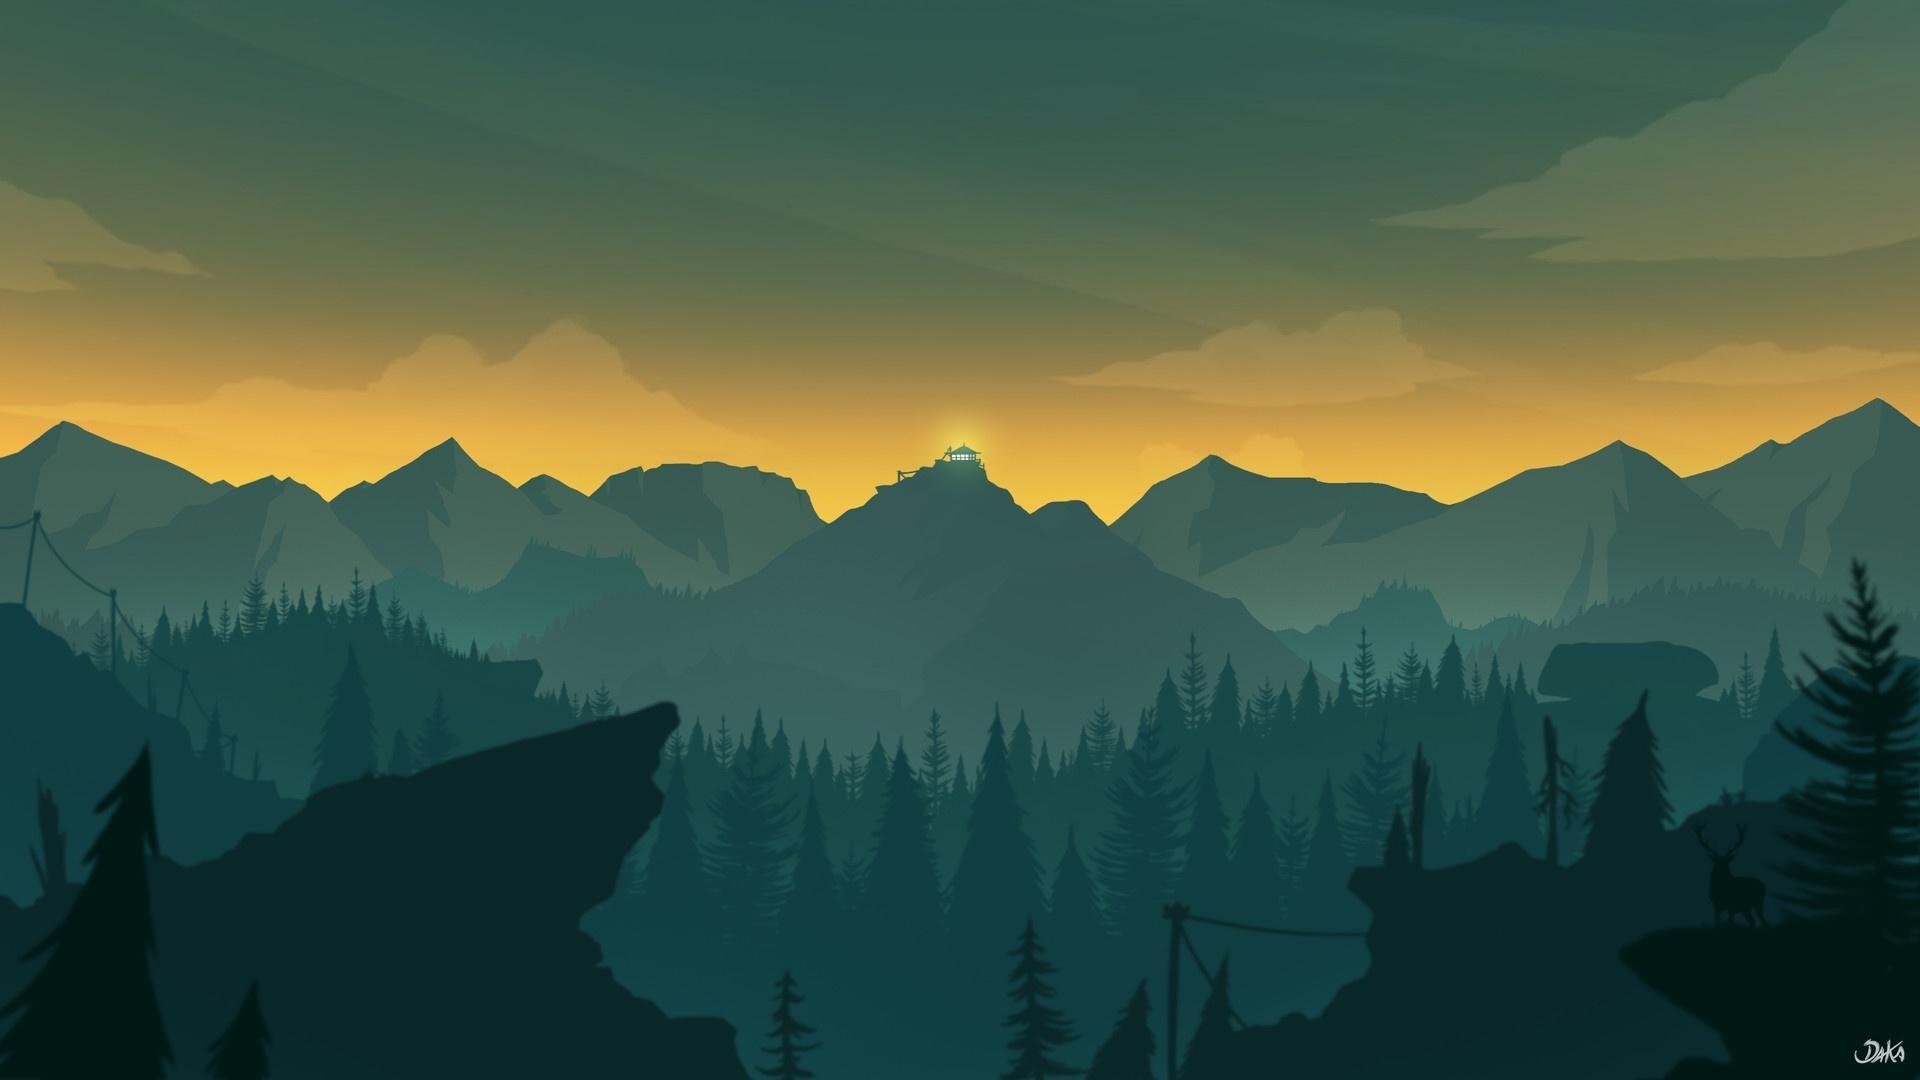 Firewatch desktop wallpaper free download